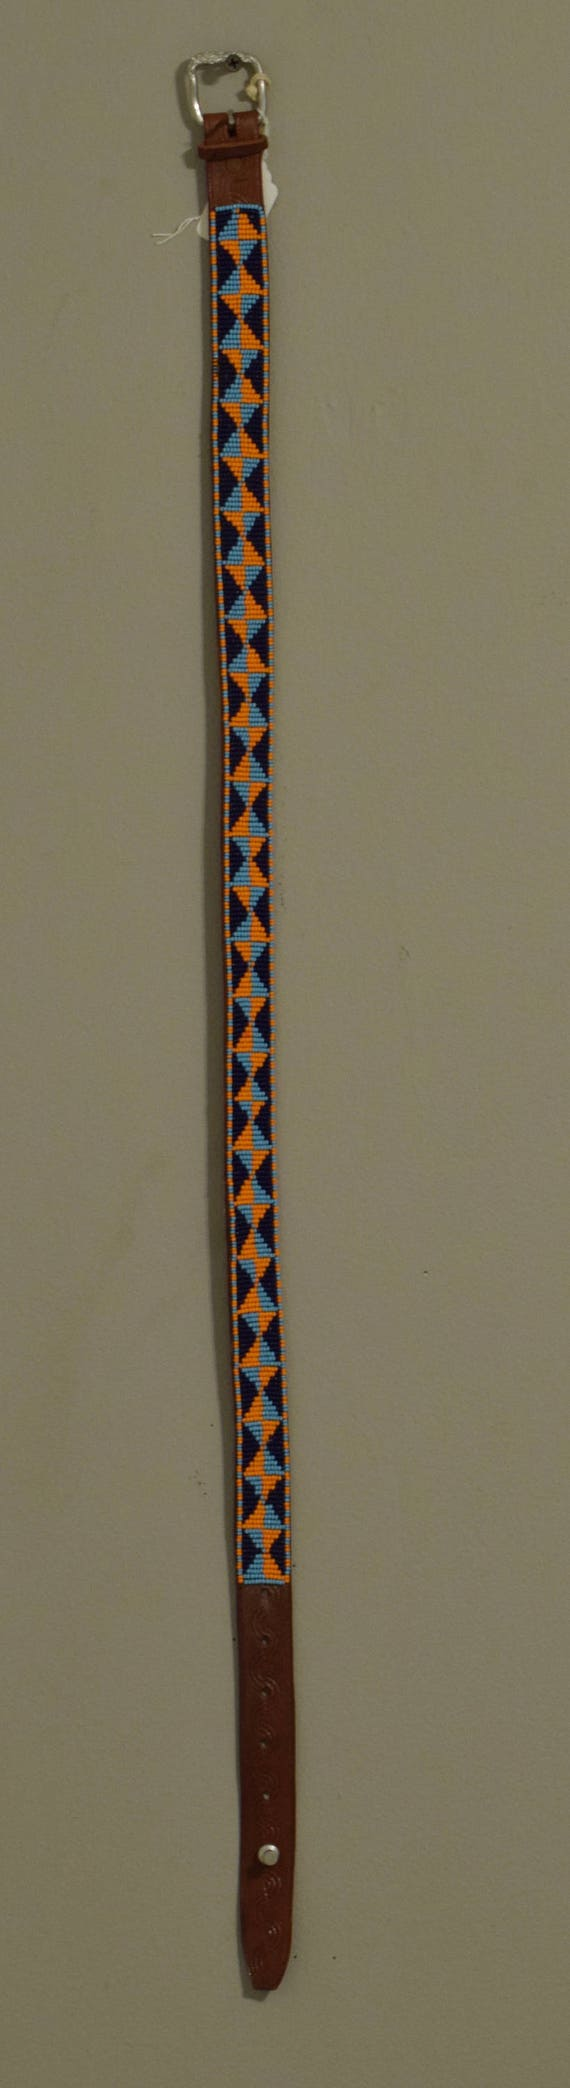 African Beaded Masai Leather Belt Handmade Men Women Orange Navy Beads Slacks Pants Skirts Masai Leather Belts